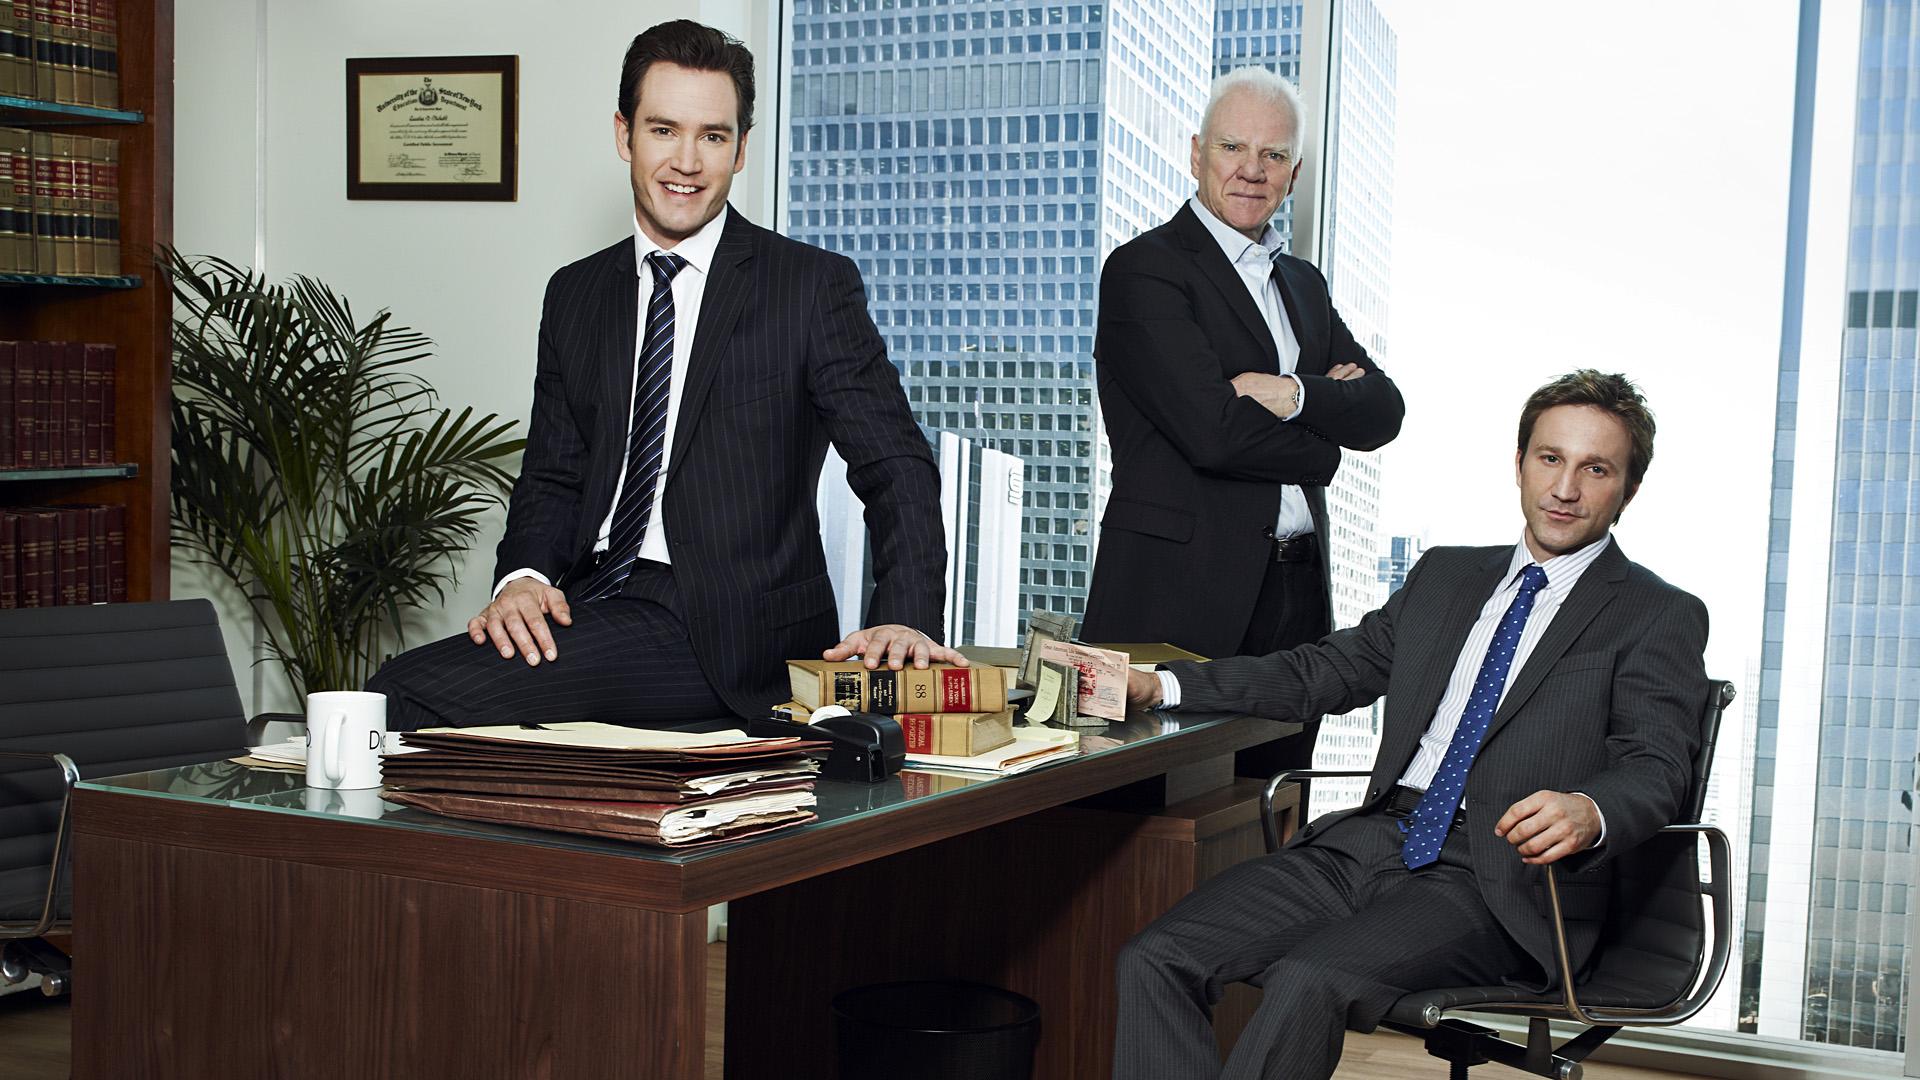 No fifth season for Franklin & Bash